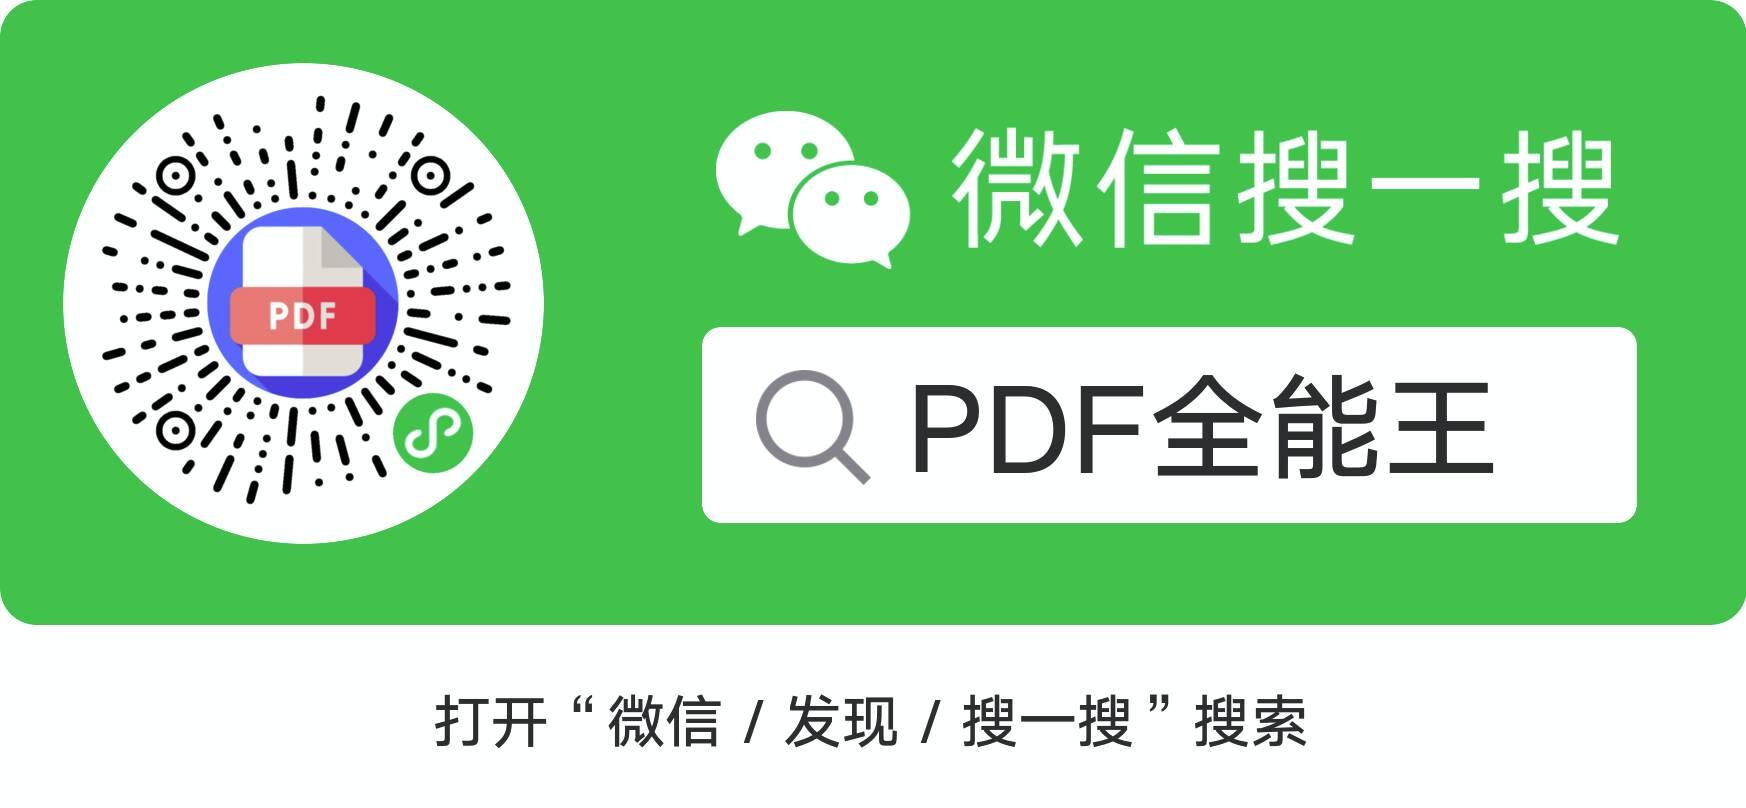 5f5c1d59ee844 - 小程序 - PDF全能王在微信里进行 PDF 转 Word/Excel/Epub/Mobi、PDF 压缩、编辑等功能